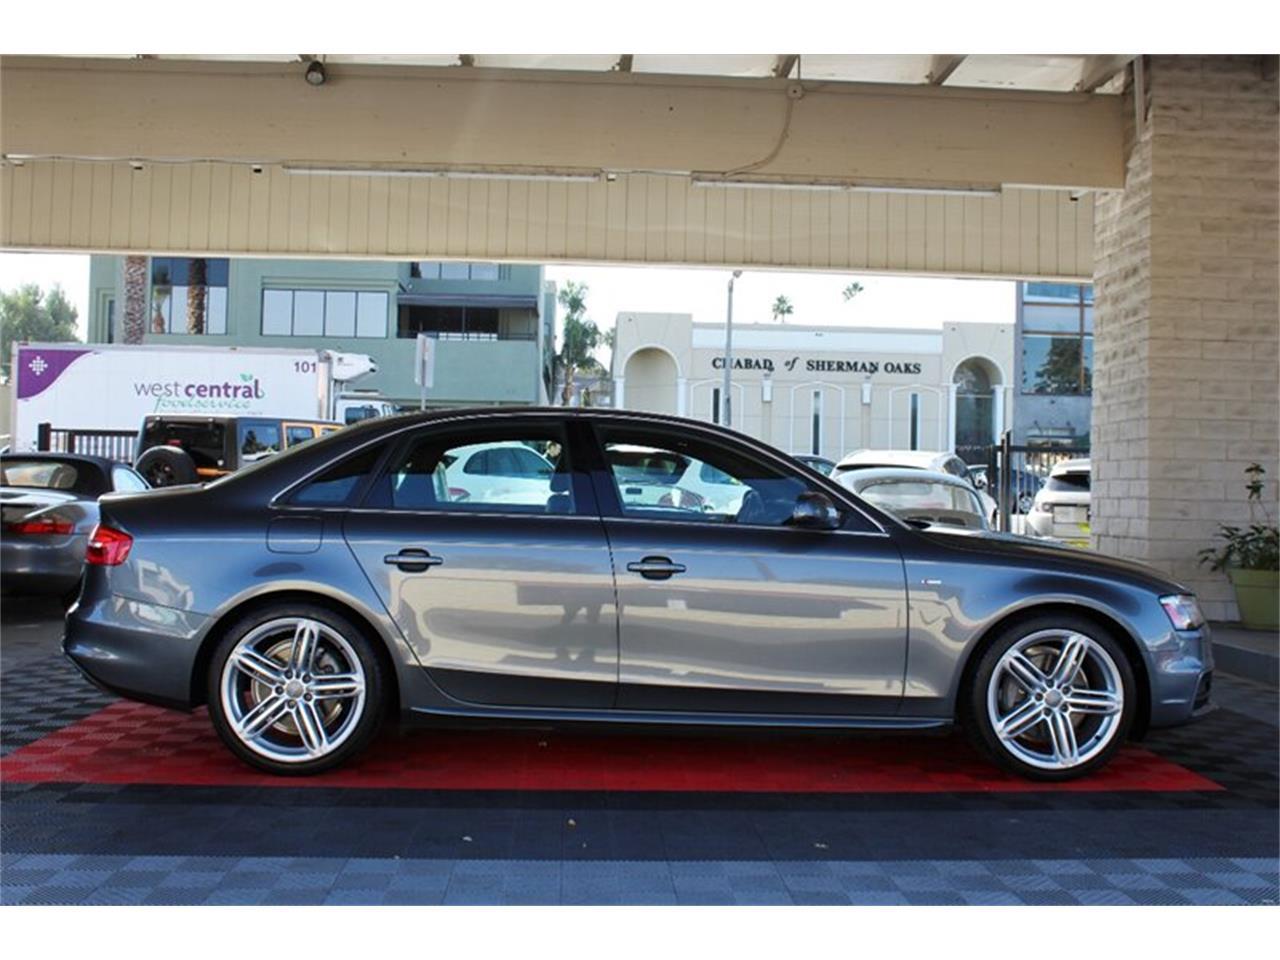 2013 Audi A4 (CC-1296823) for sale in Sherman Oaks, California